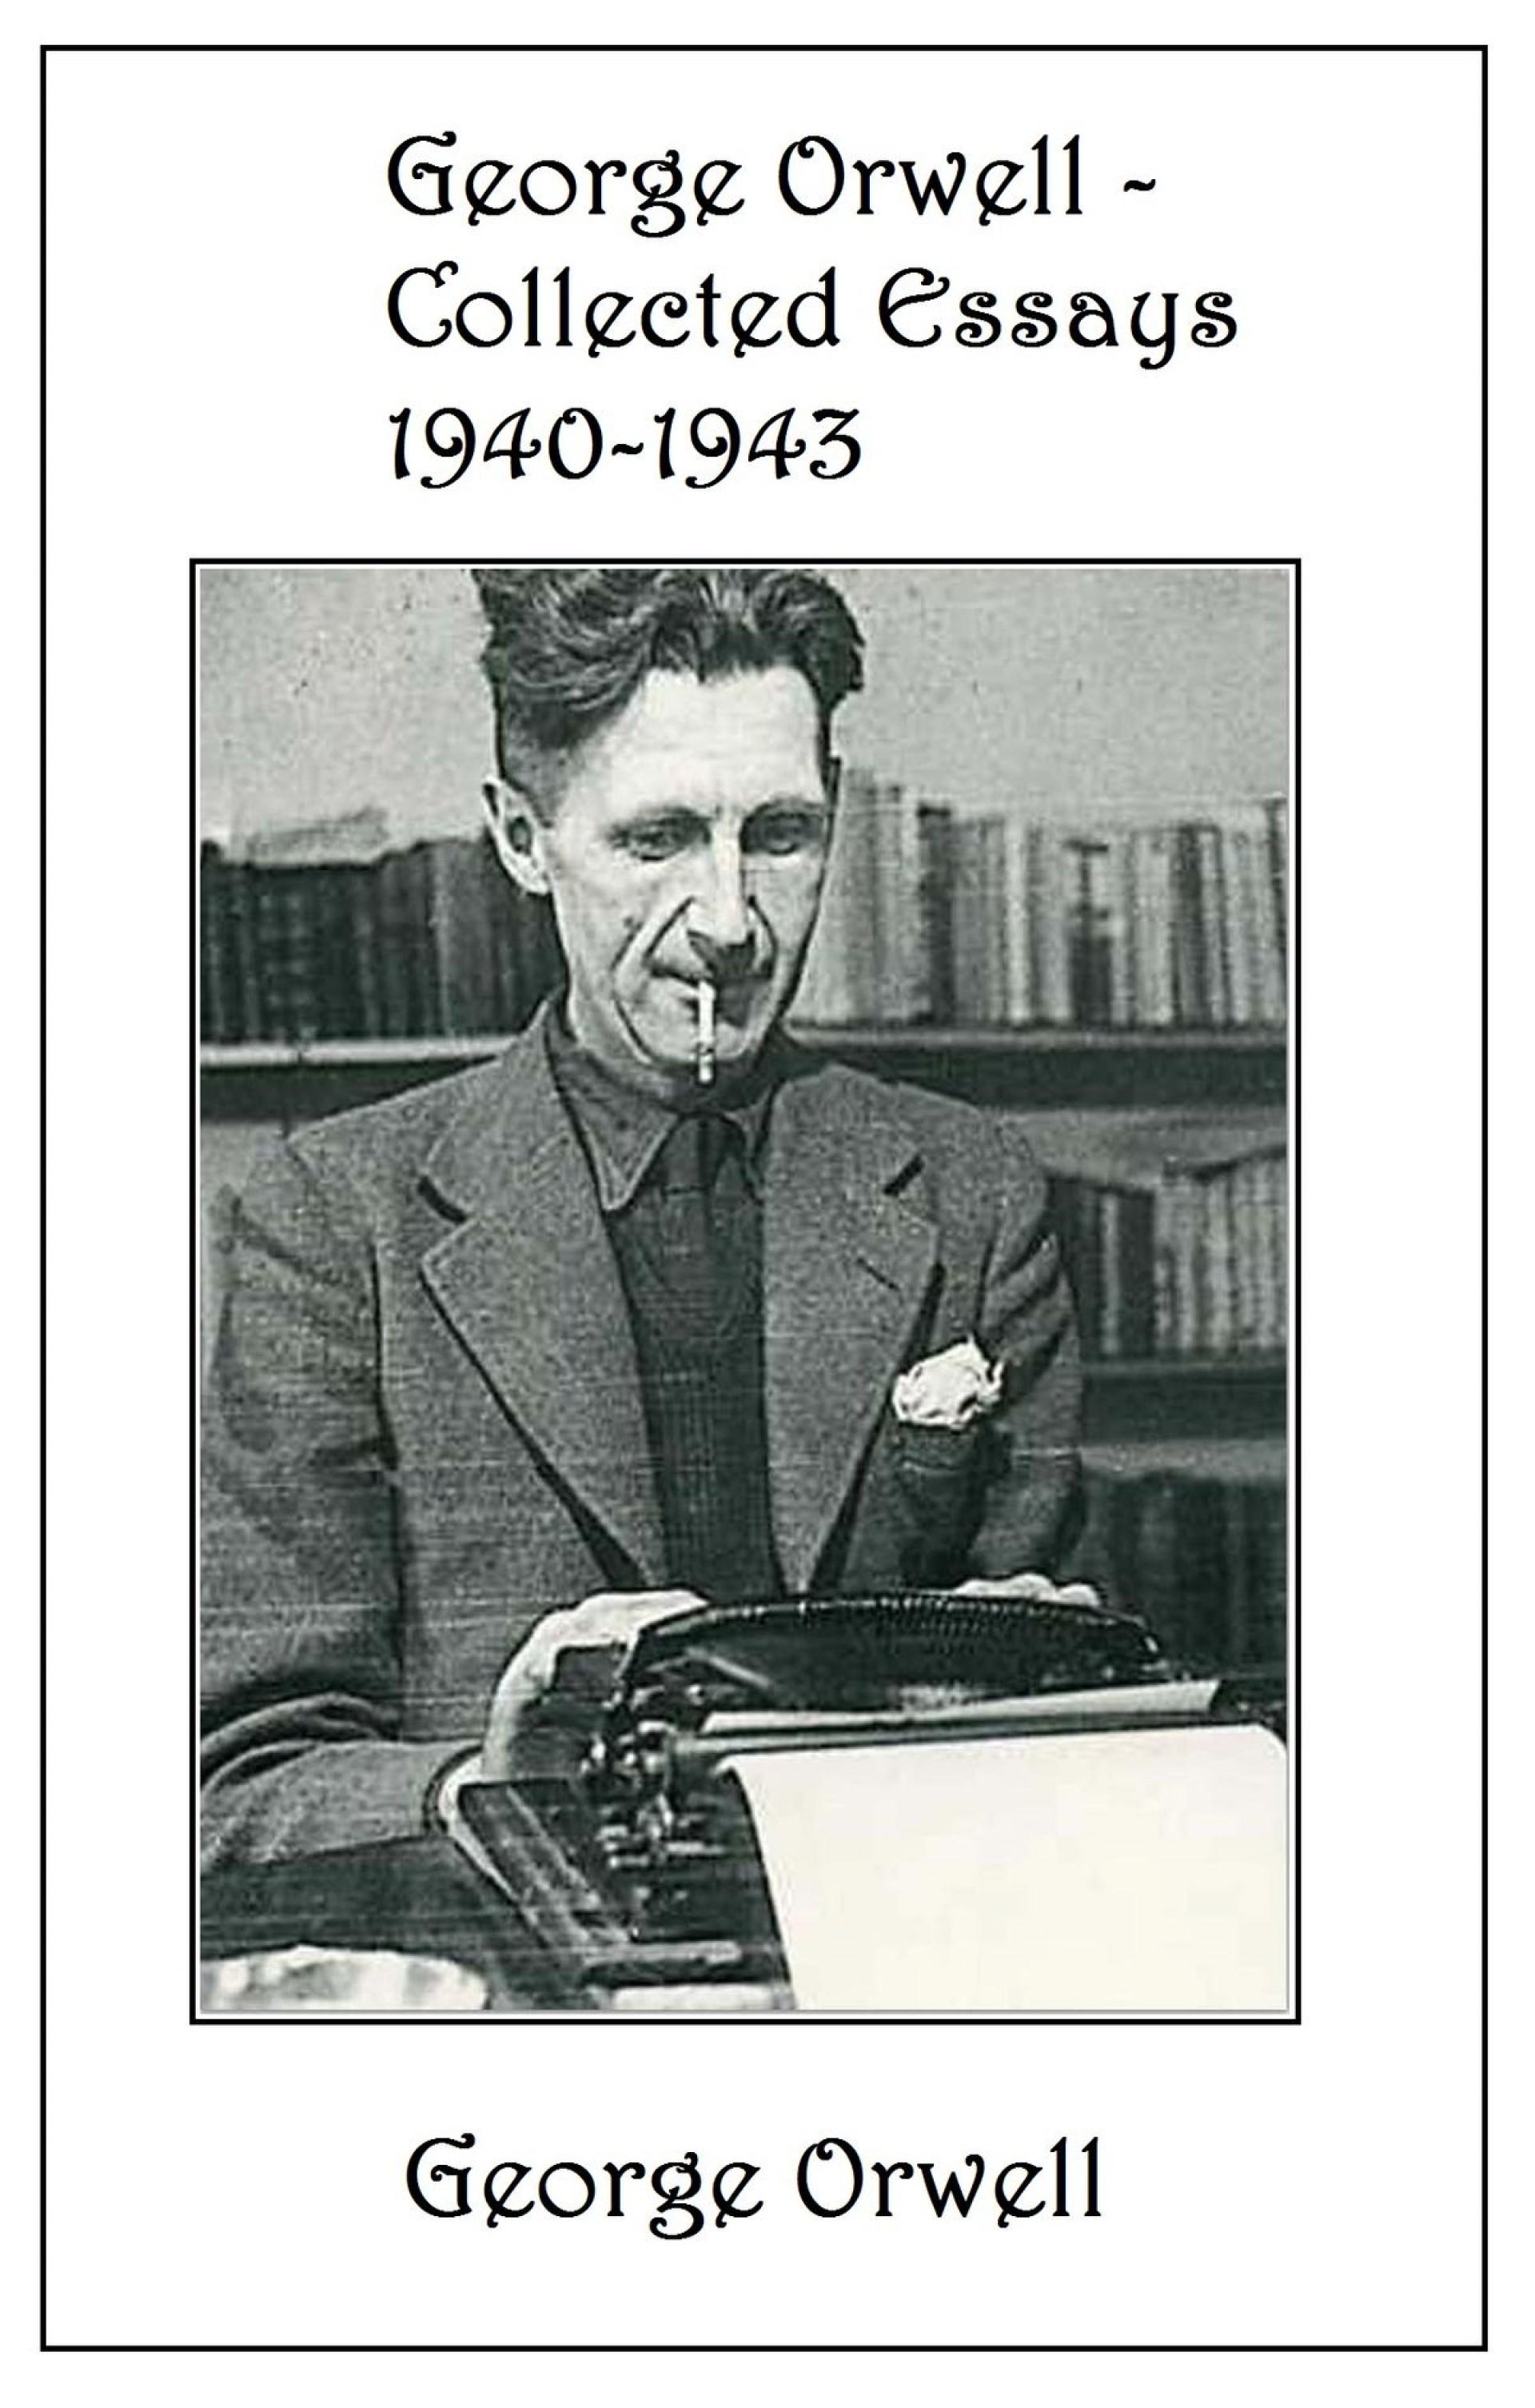 002 George Orwell Collected Essays Essay Frightening 1984 Summary Pdf On Writing 1920